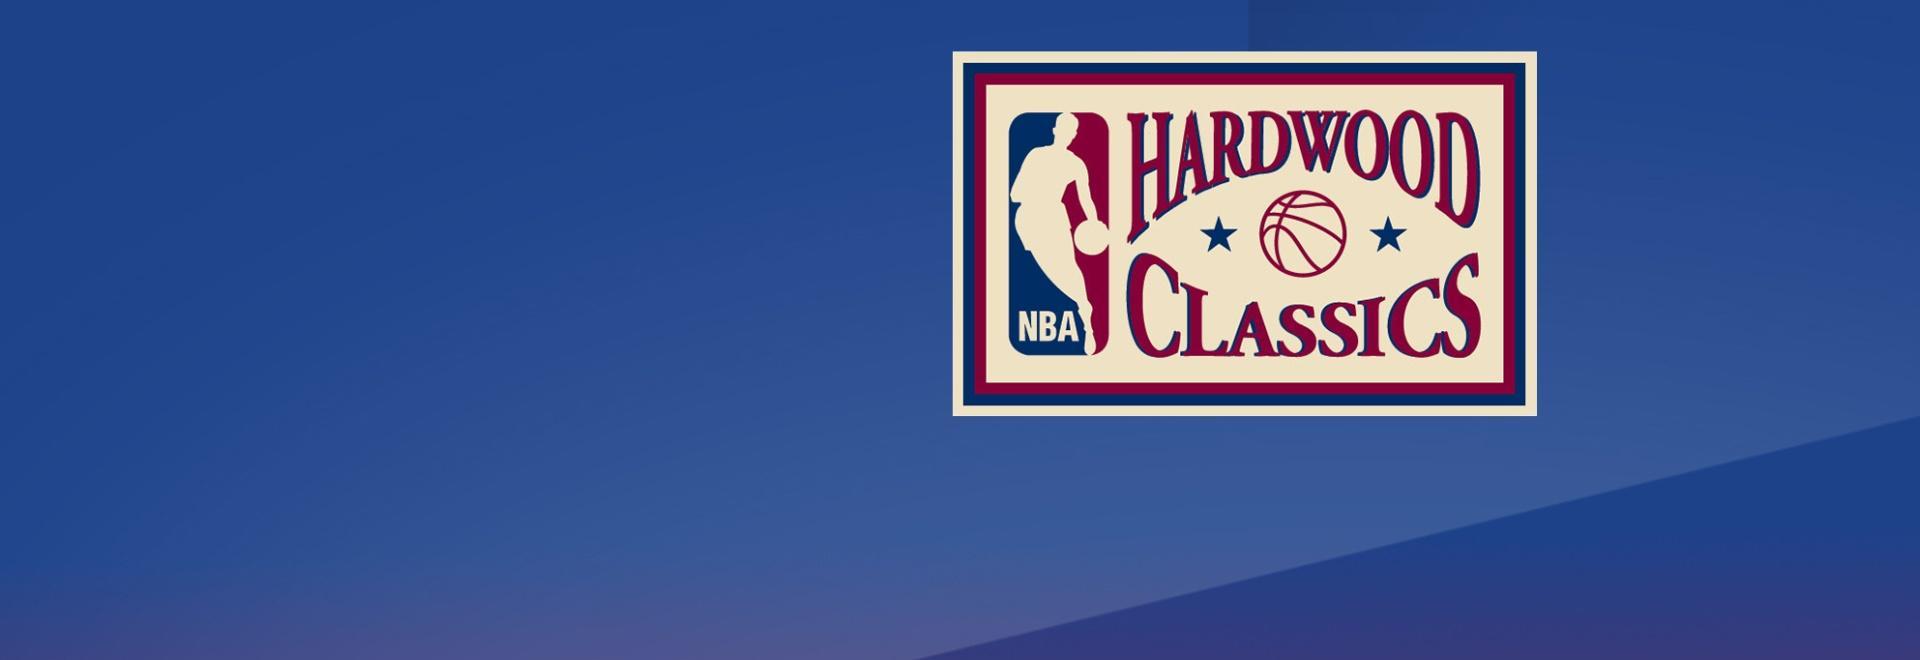 Cavaliers - Raptors 20/03/05 LeBron to 50+ Pts. NBA History